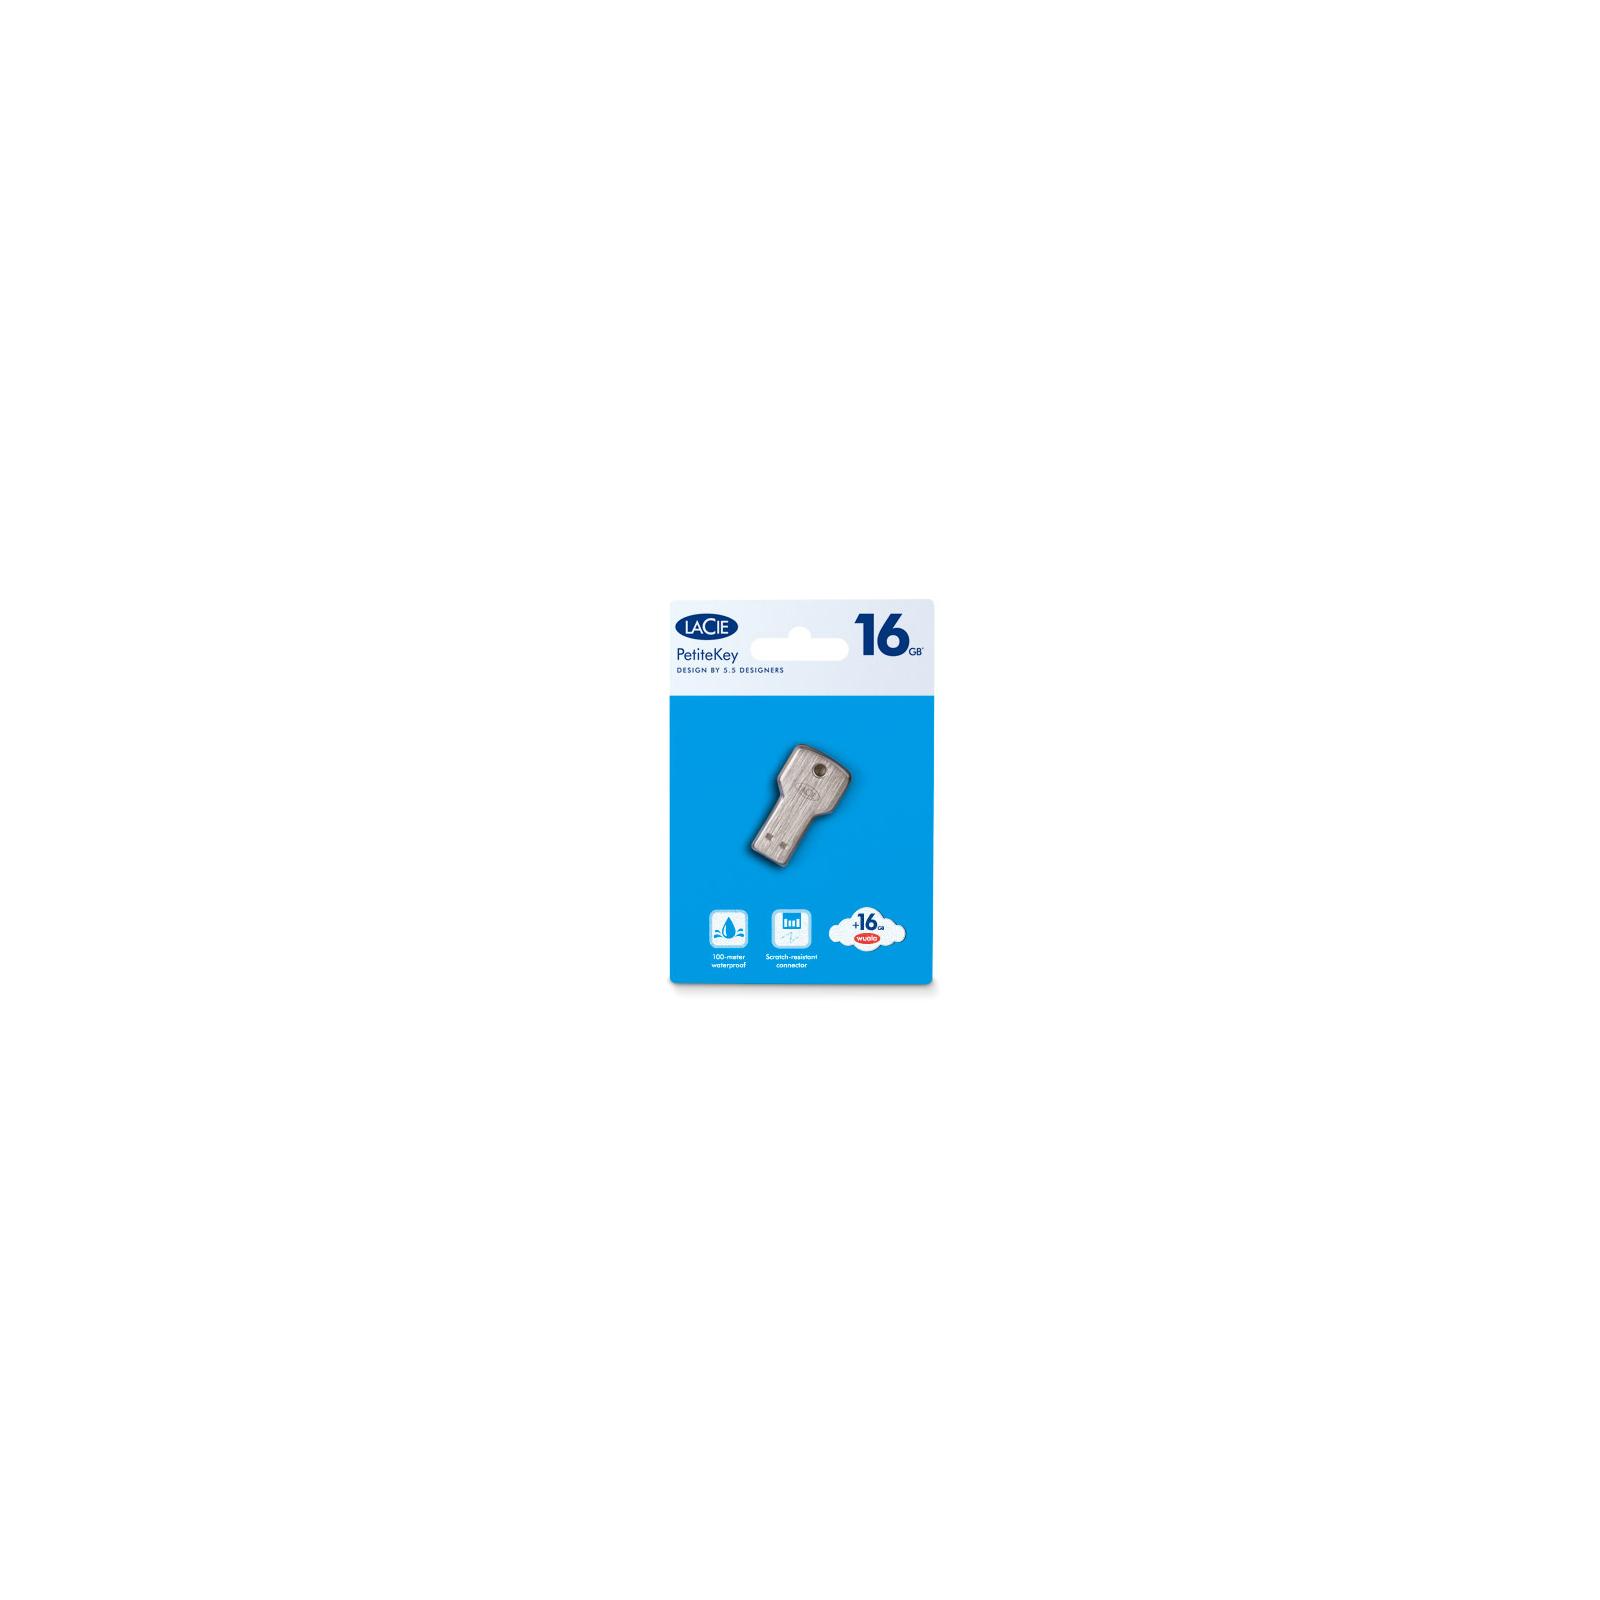 USB флеш накопитель LaCie 8Gb PetiteKey (9000346) изображение 6